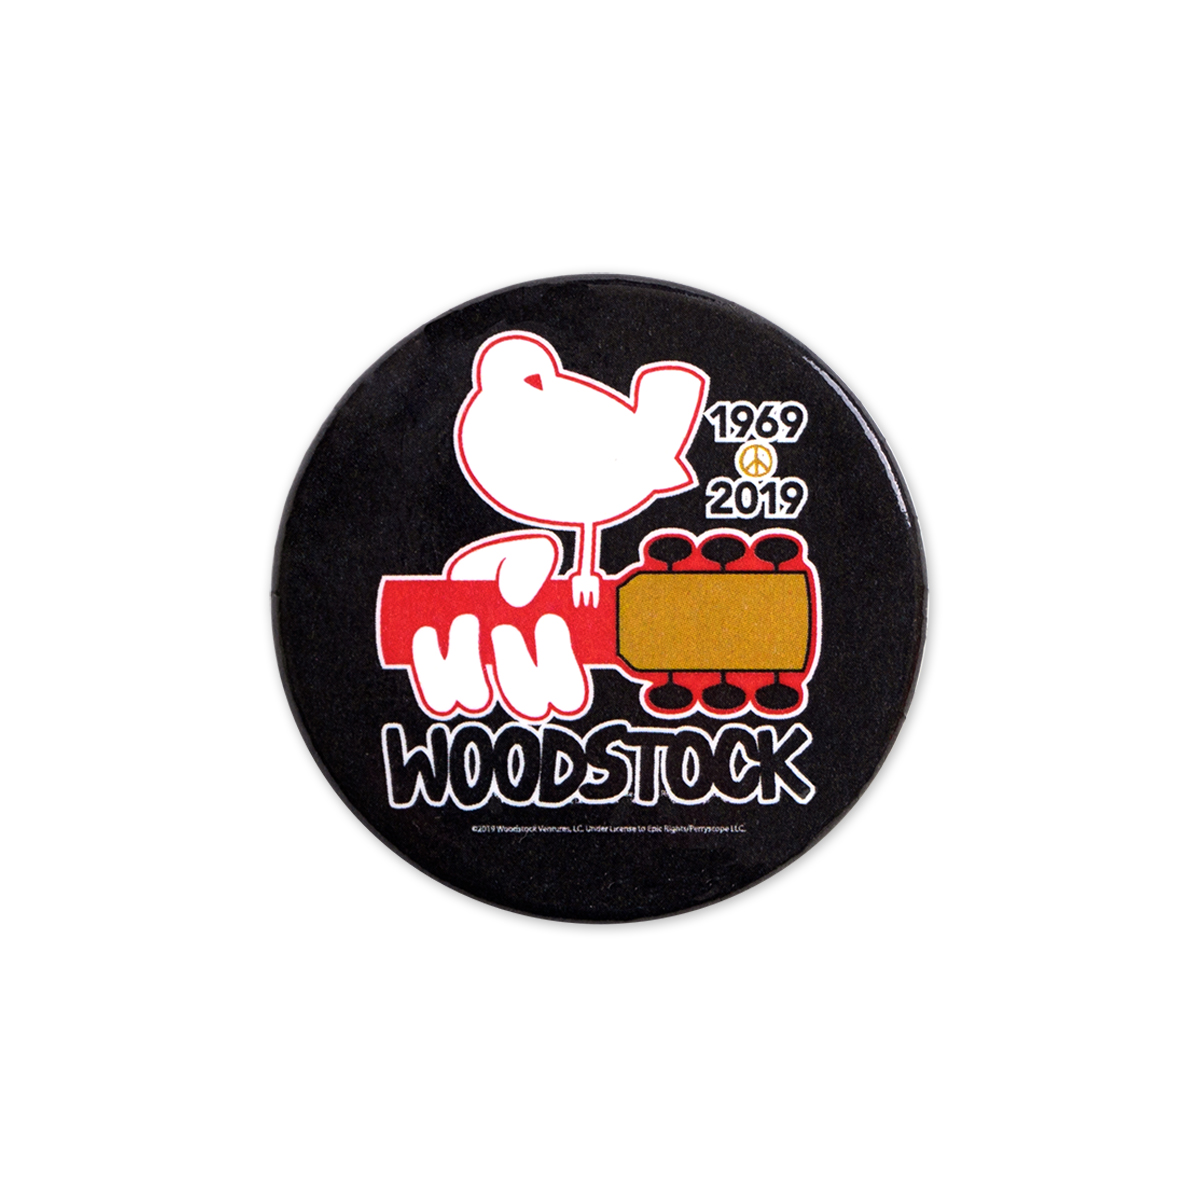 Woodstock 50th Anniversary Black Pin